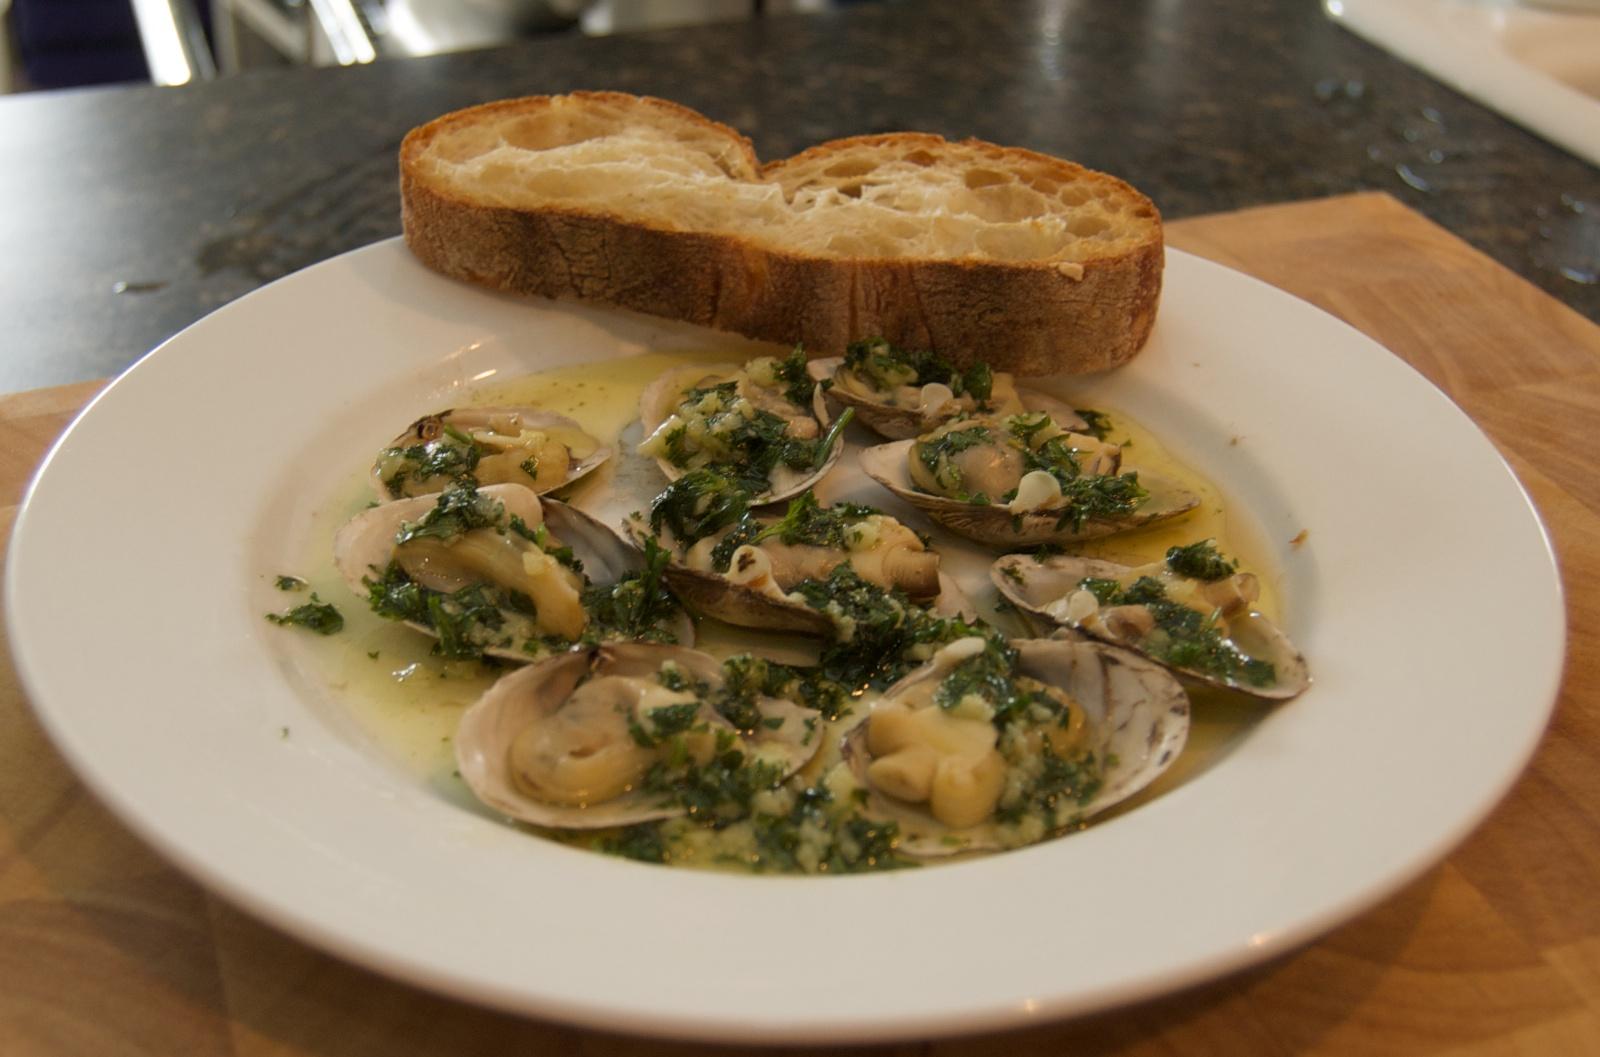 http://blog.rickk.com/food/2010/07/18/clams1.jpg